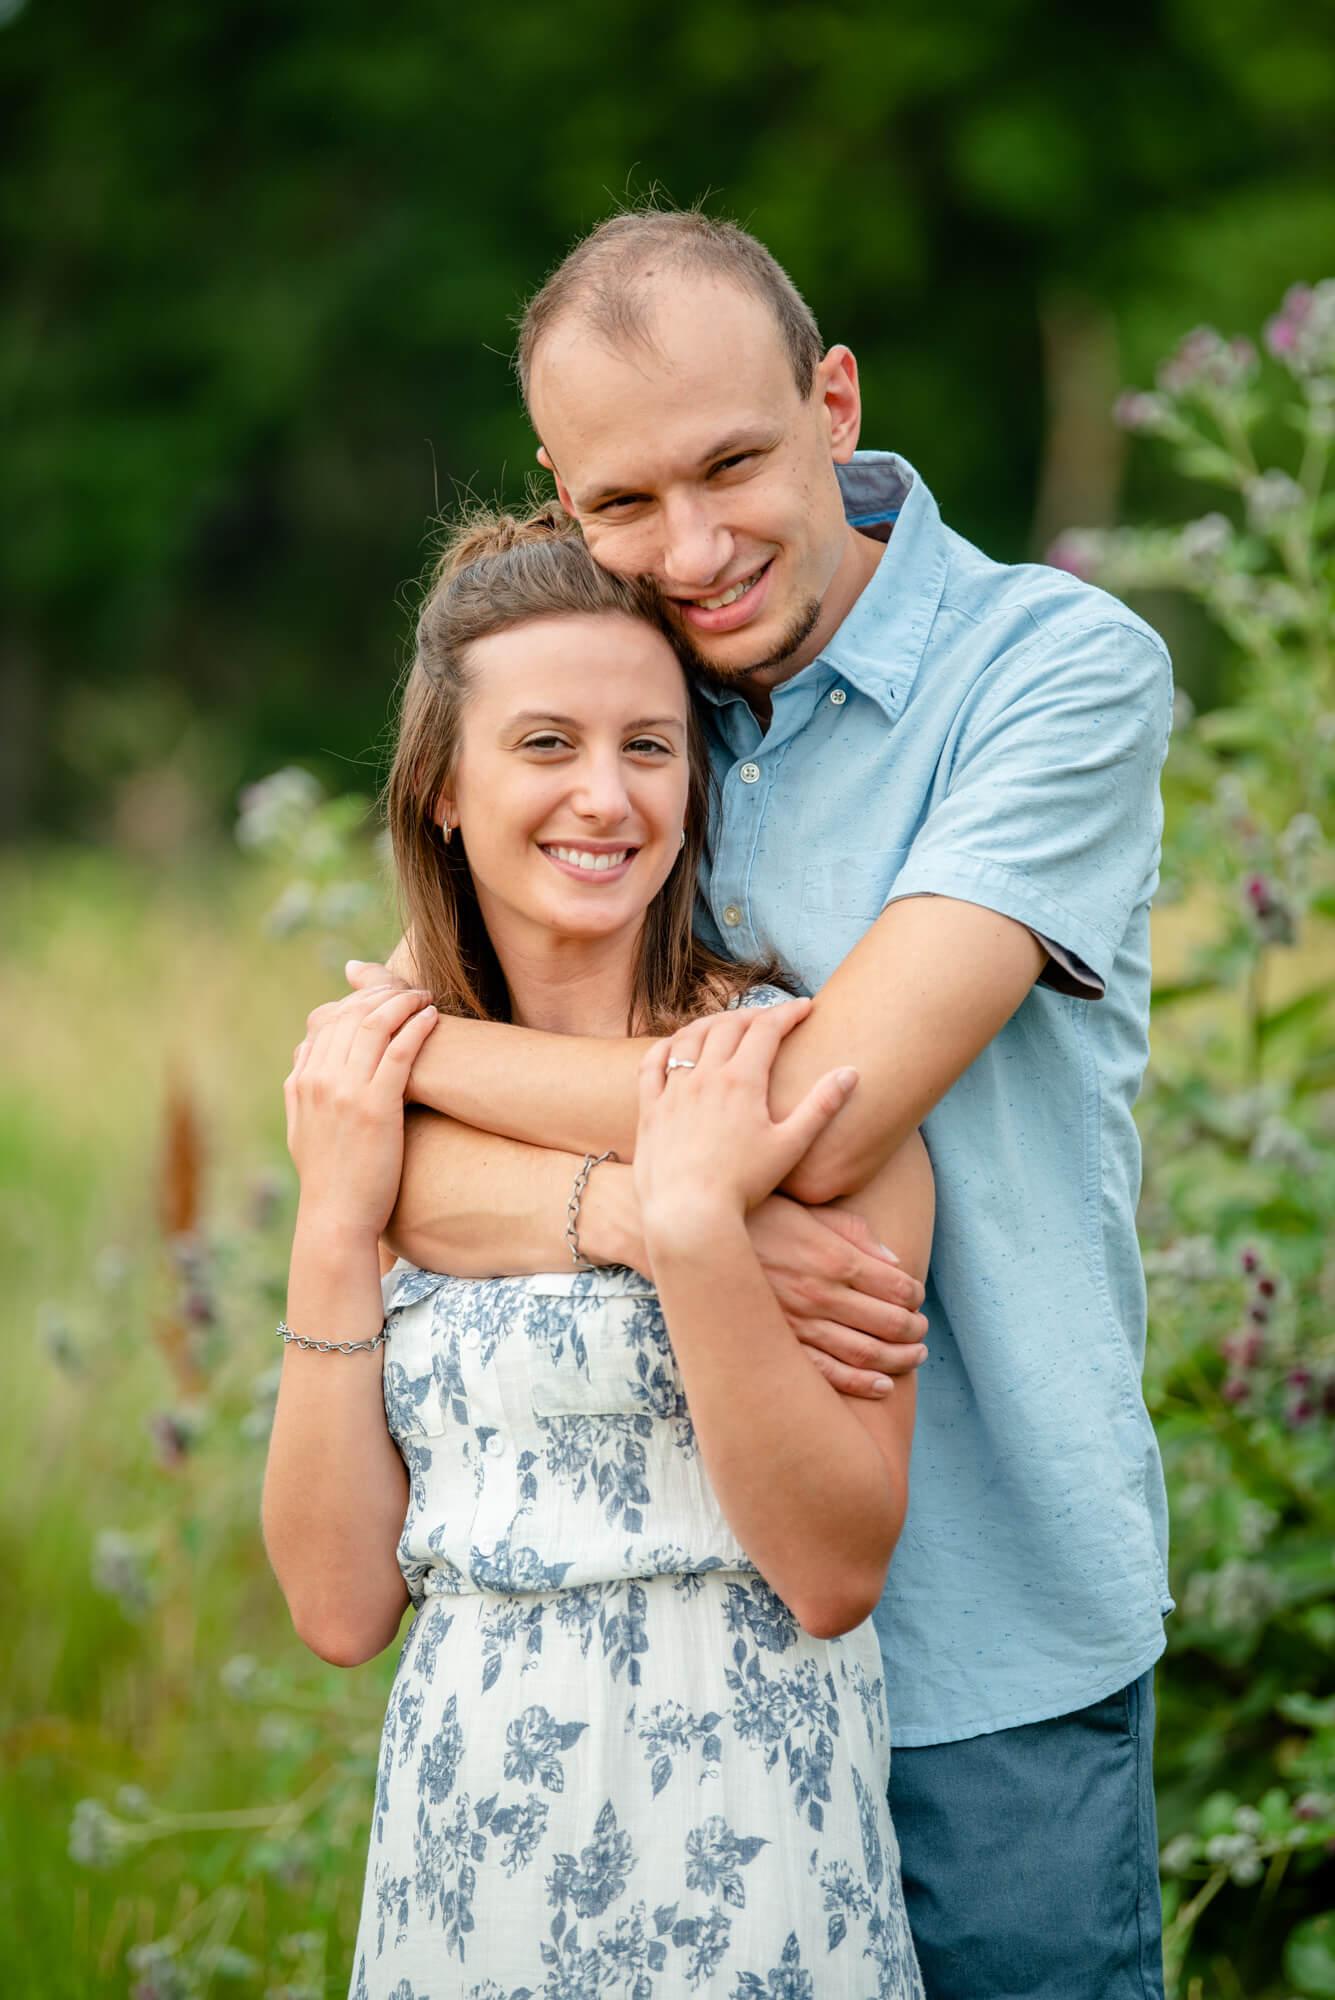 DSC 4797 - John and Faith's Engagement   Fargo, North Dakota